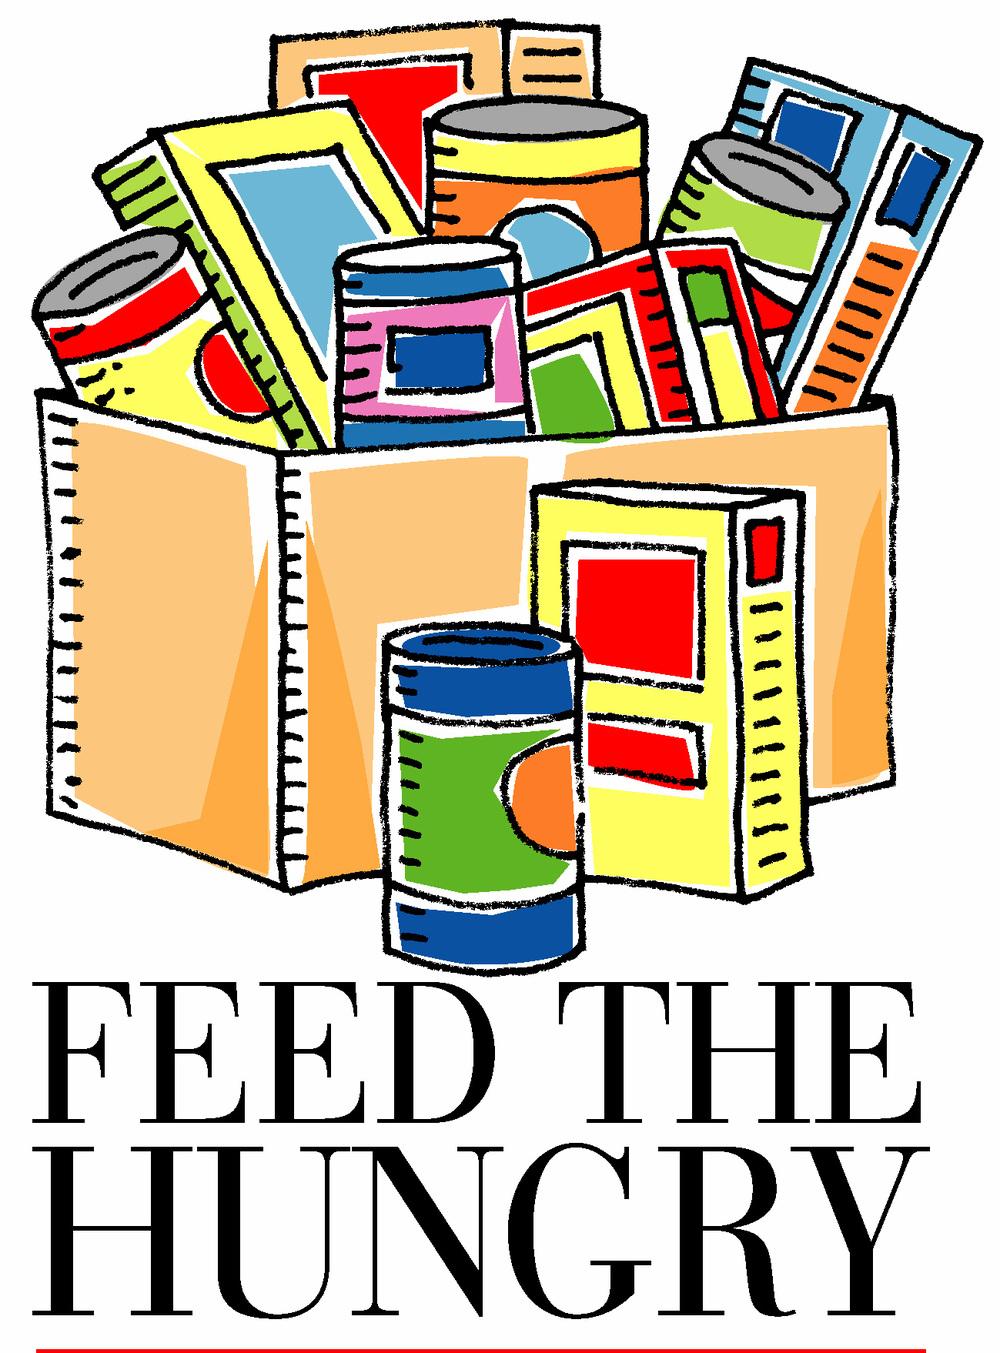 feedthehungry.jpg